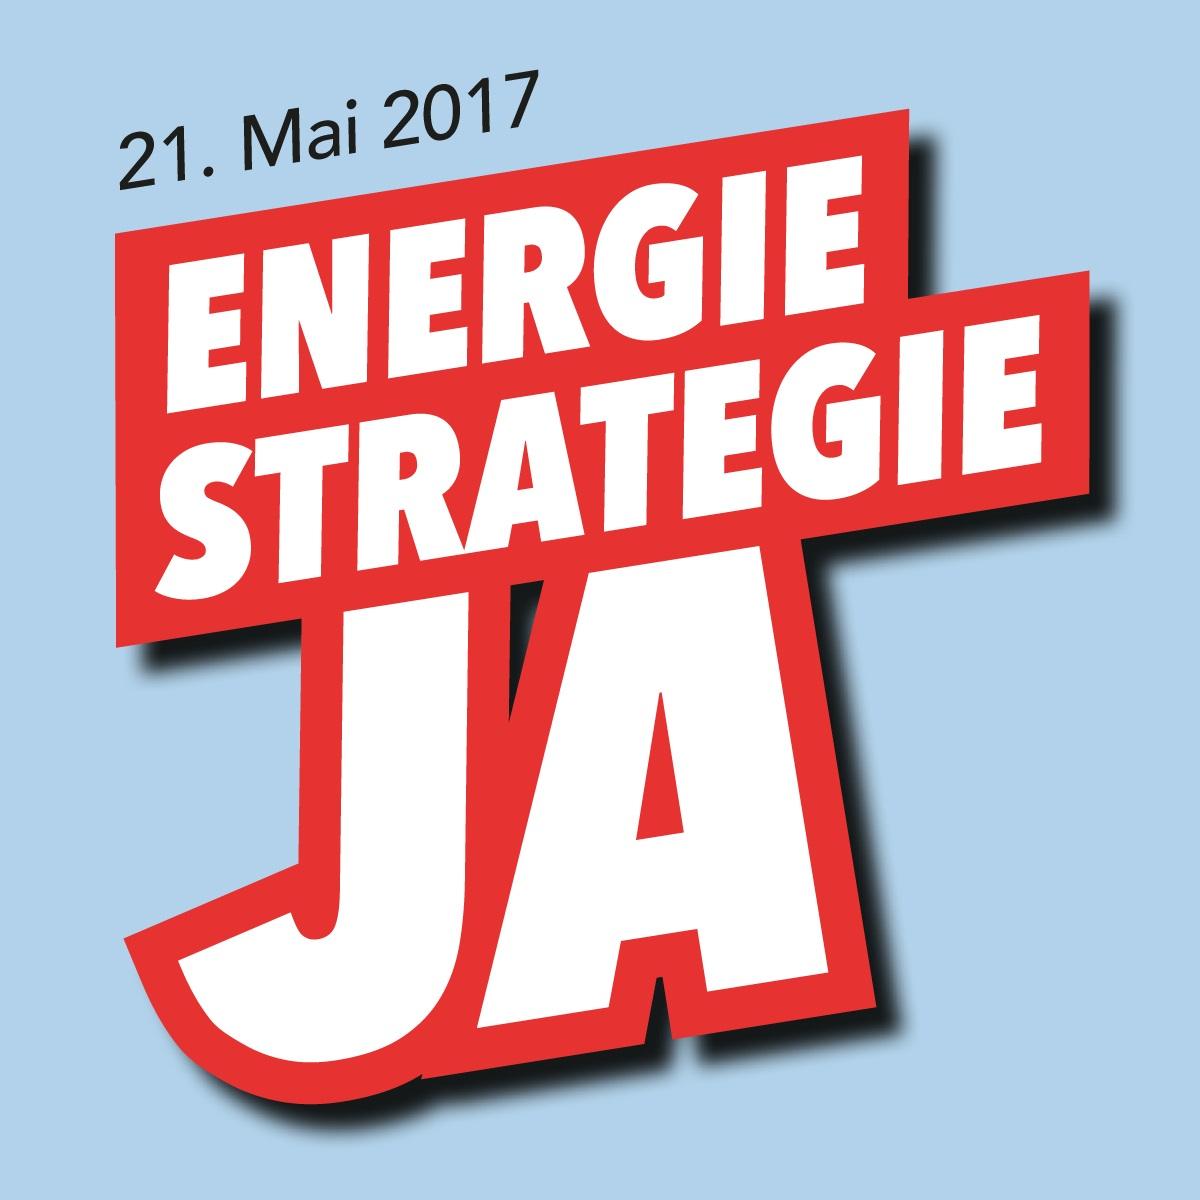 ESJ Profil de Energiestrategie 2050 JA!